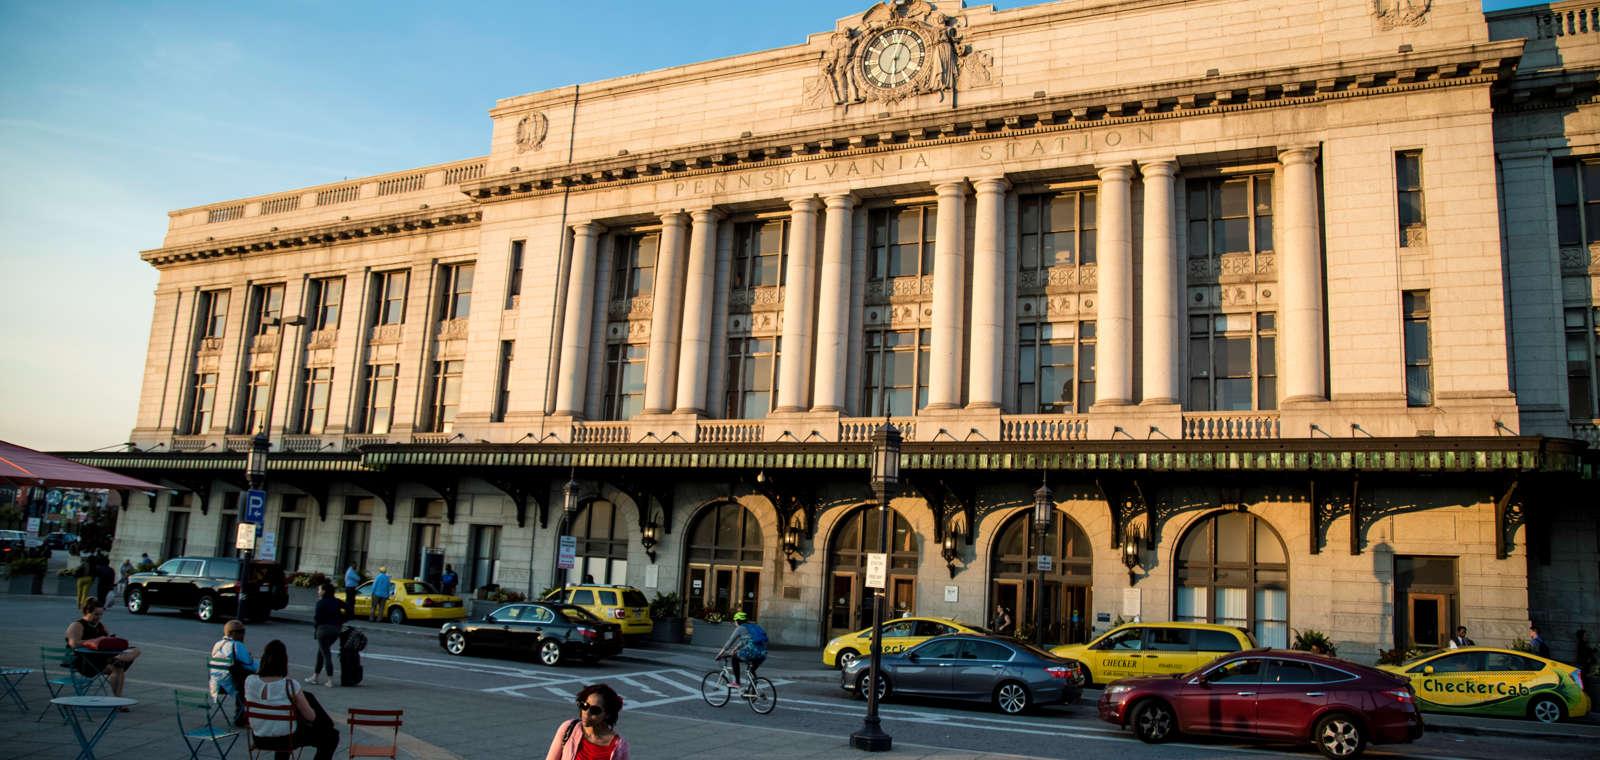 Baltimore Penn Station Front Entrance